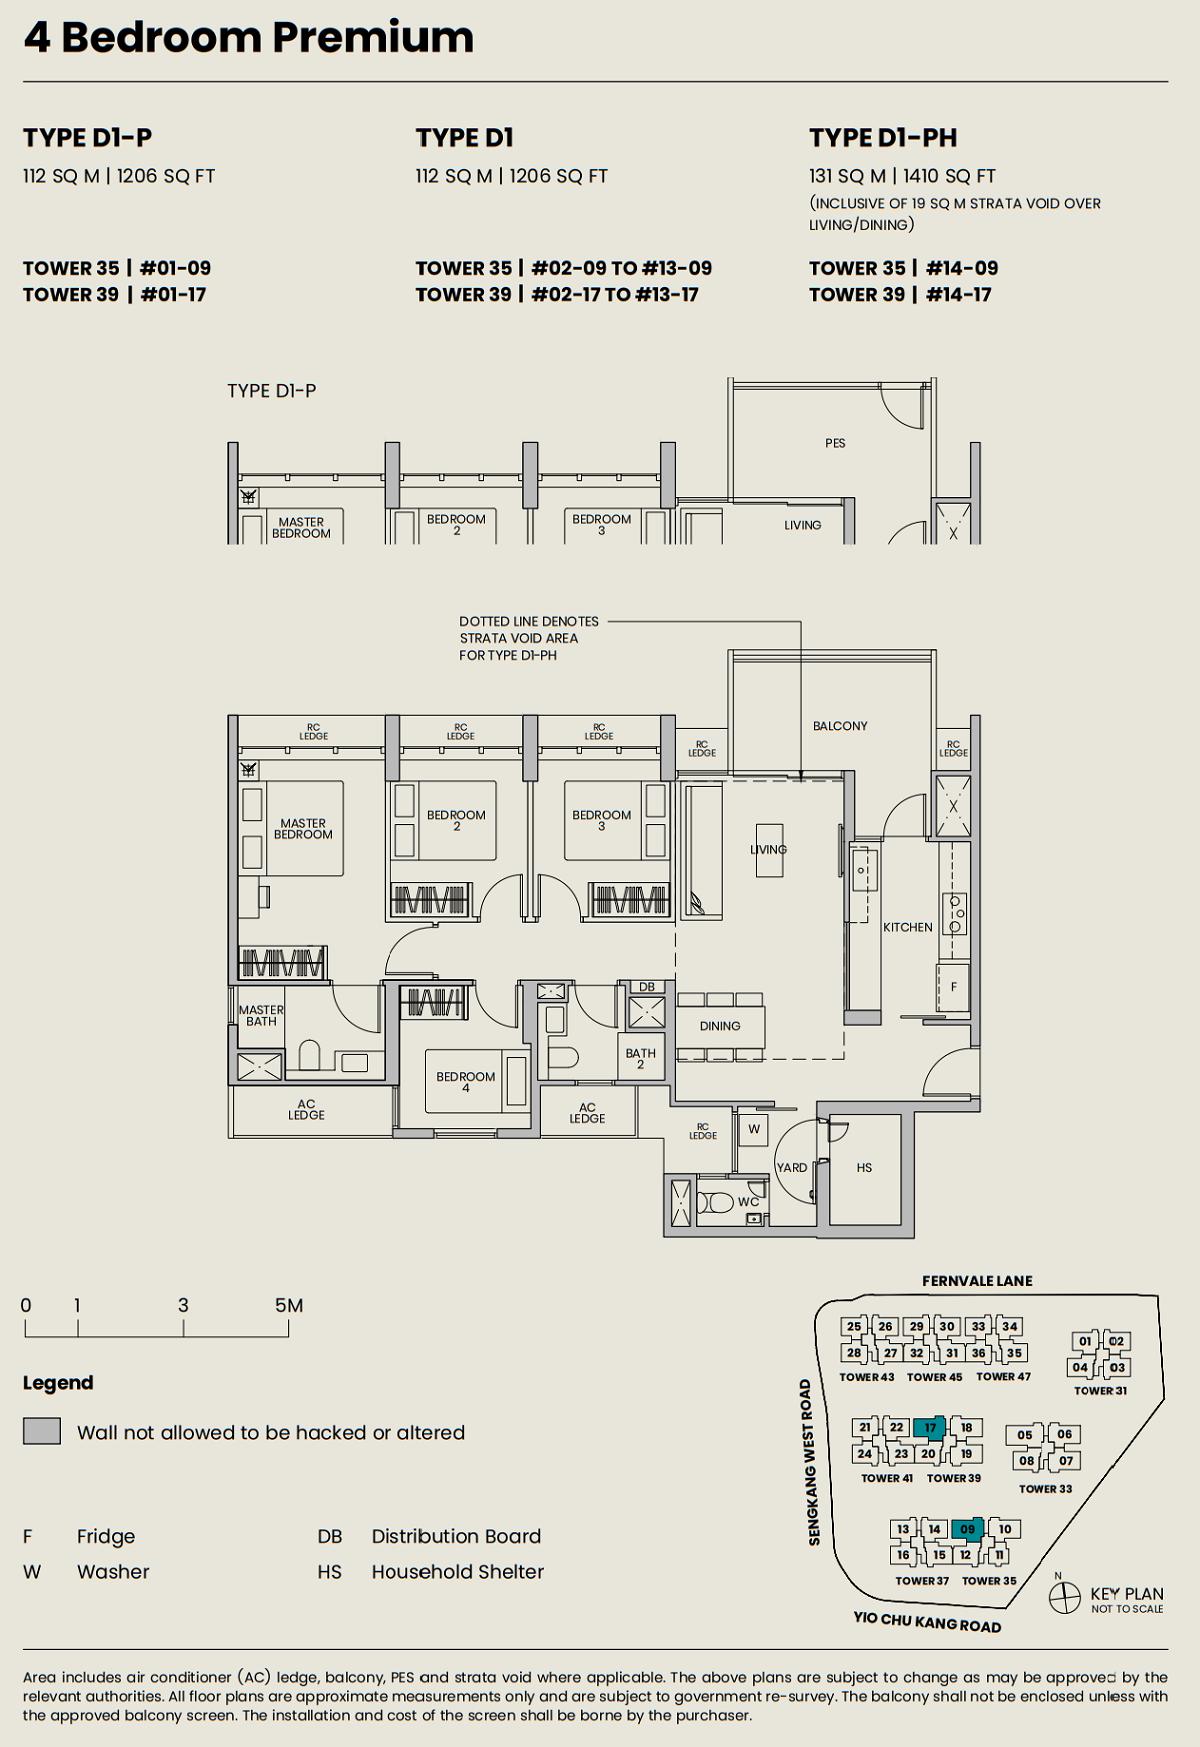 Parc Greenwich Floor Plan 4BRP Type D1 112_1206